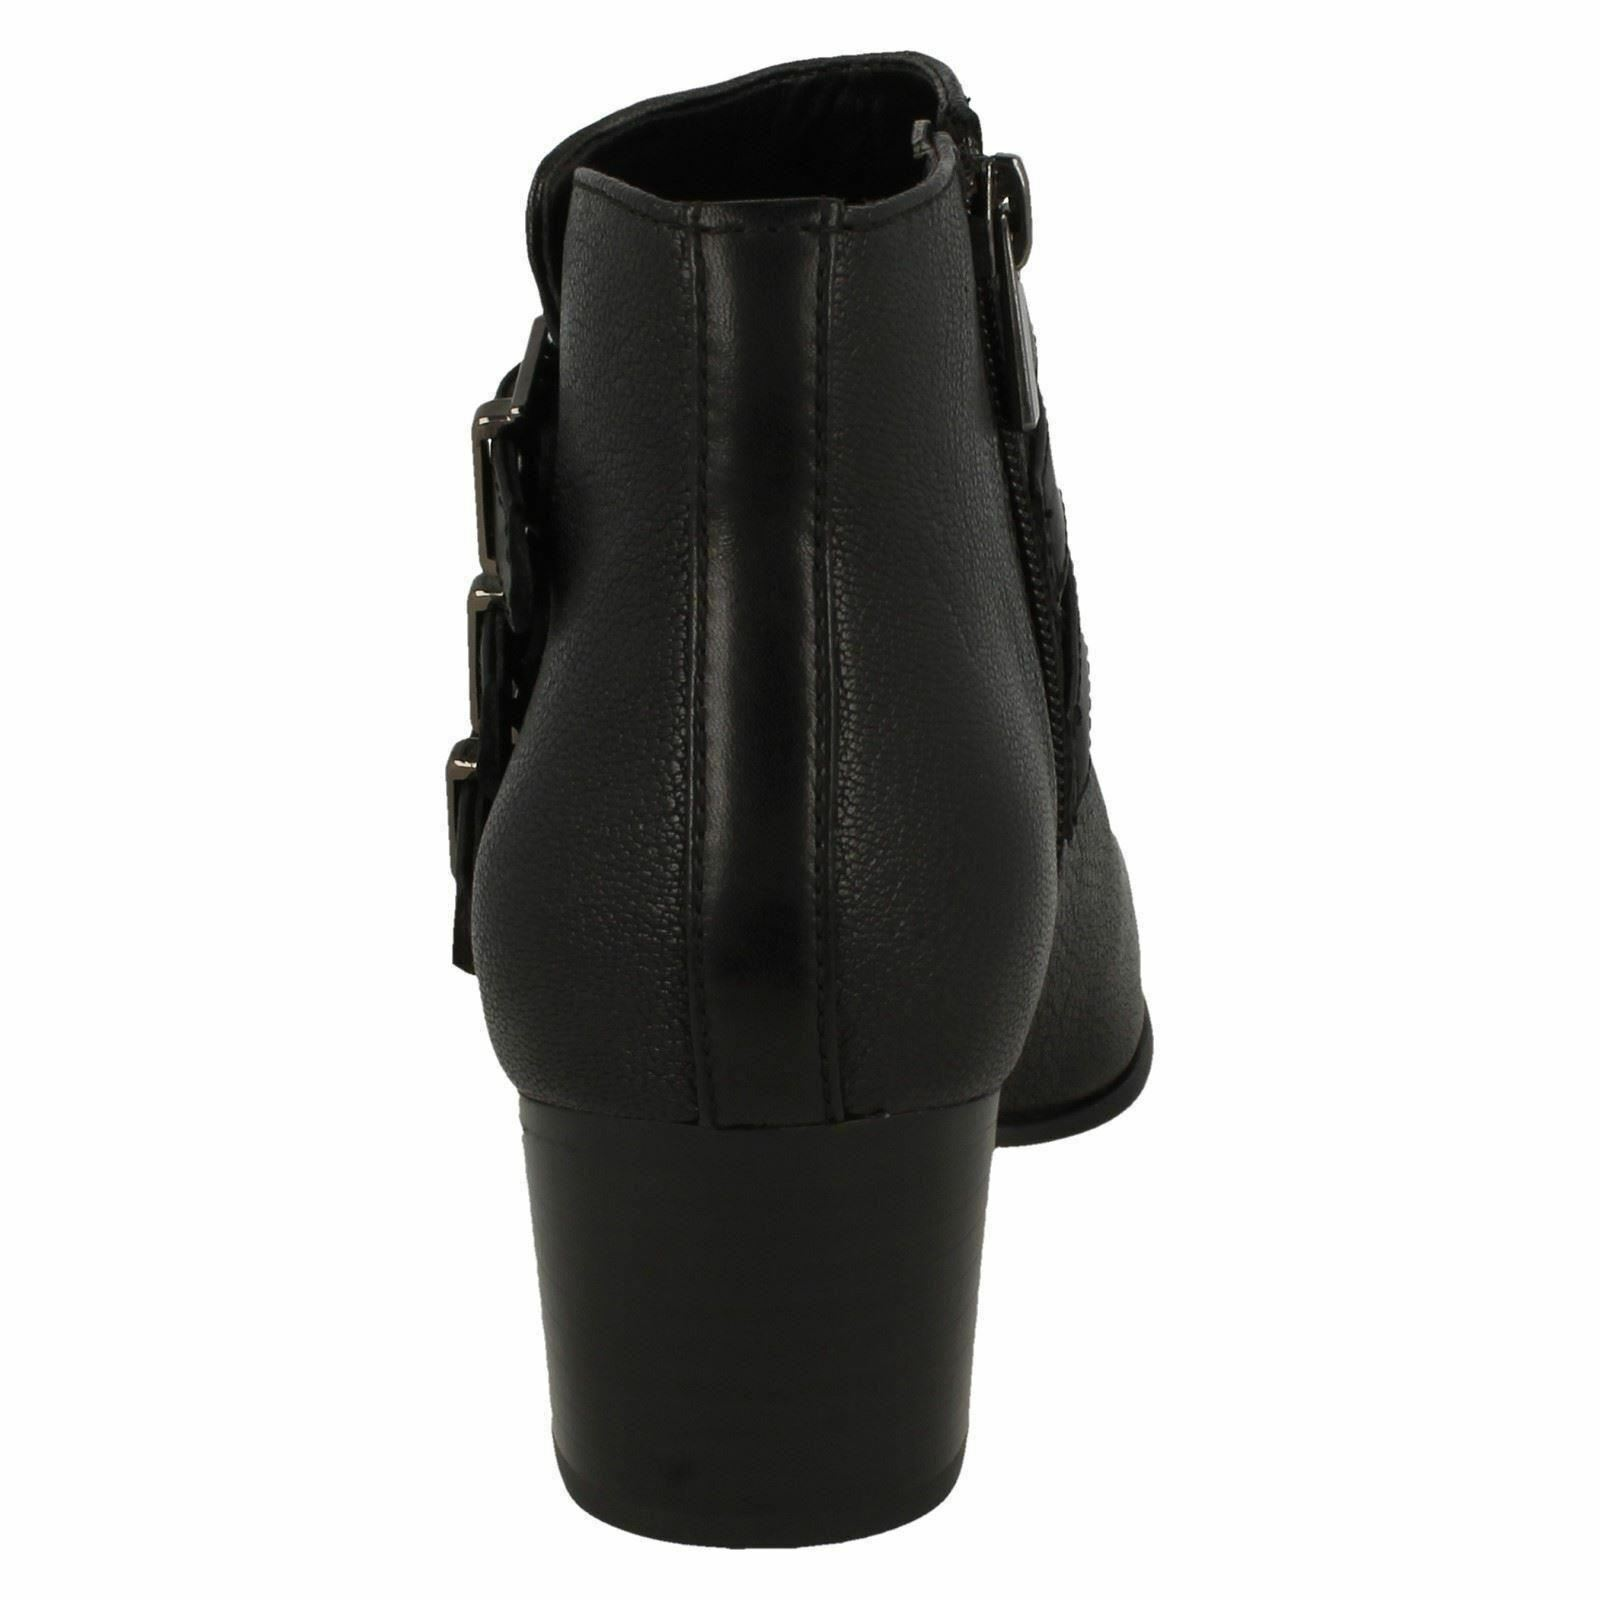 Damen Schwarzes Clarks Maypearl Rayna Schwarzes Damen Leder Elegant Mittelhoch Stiefeletten c01c00